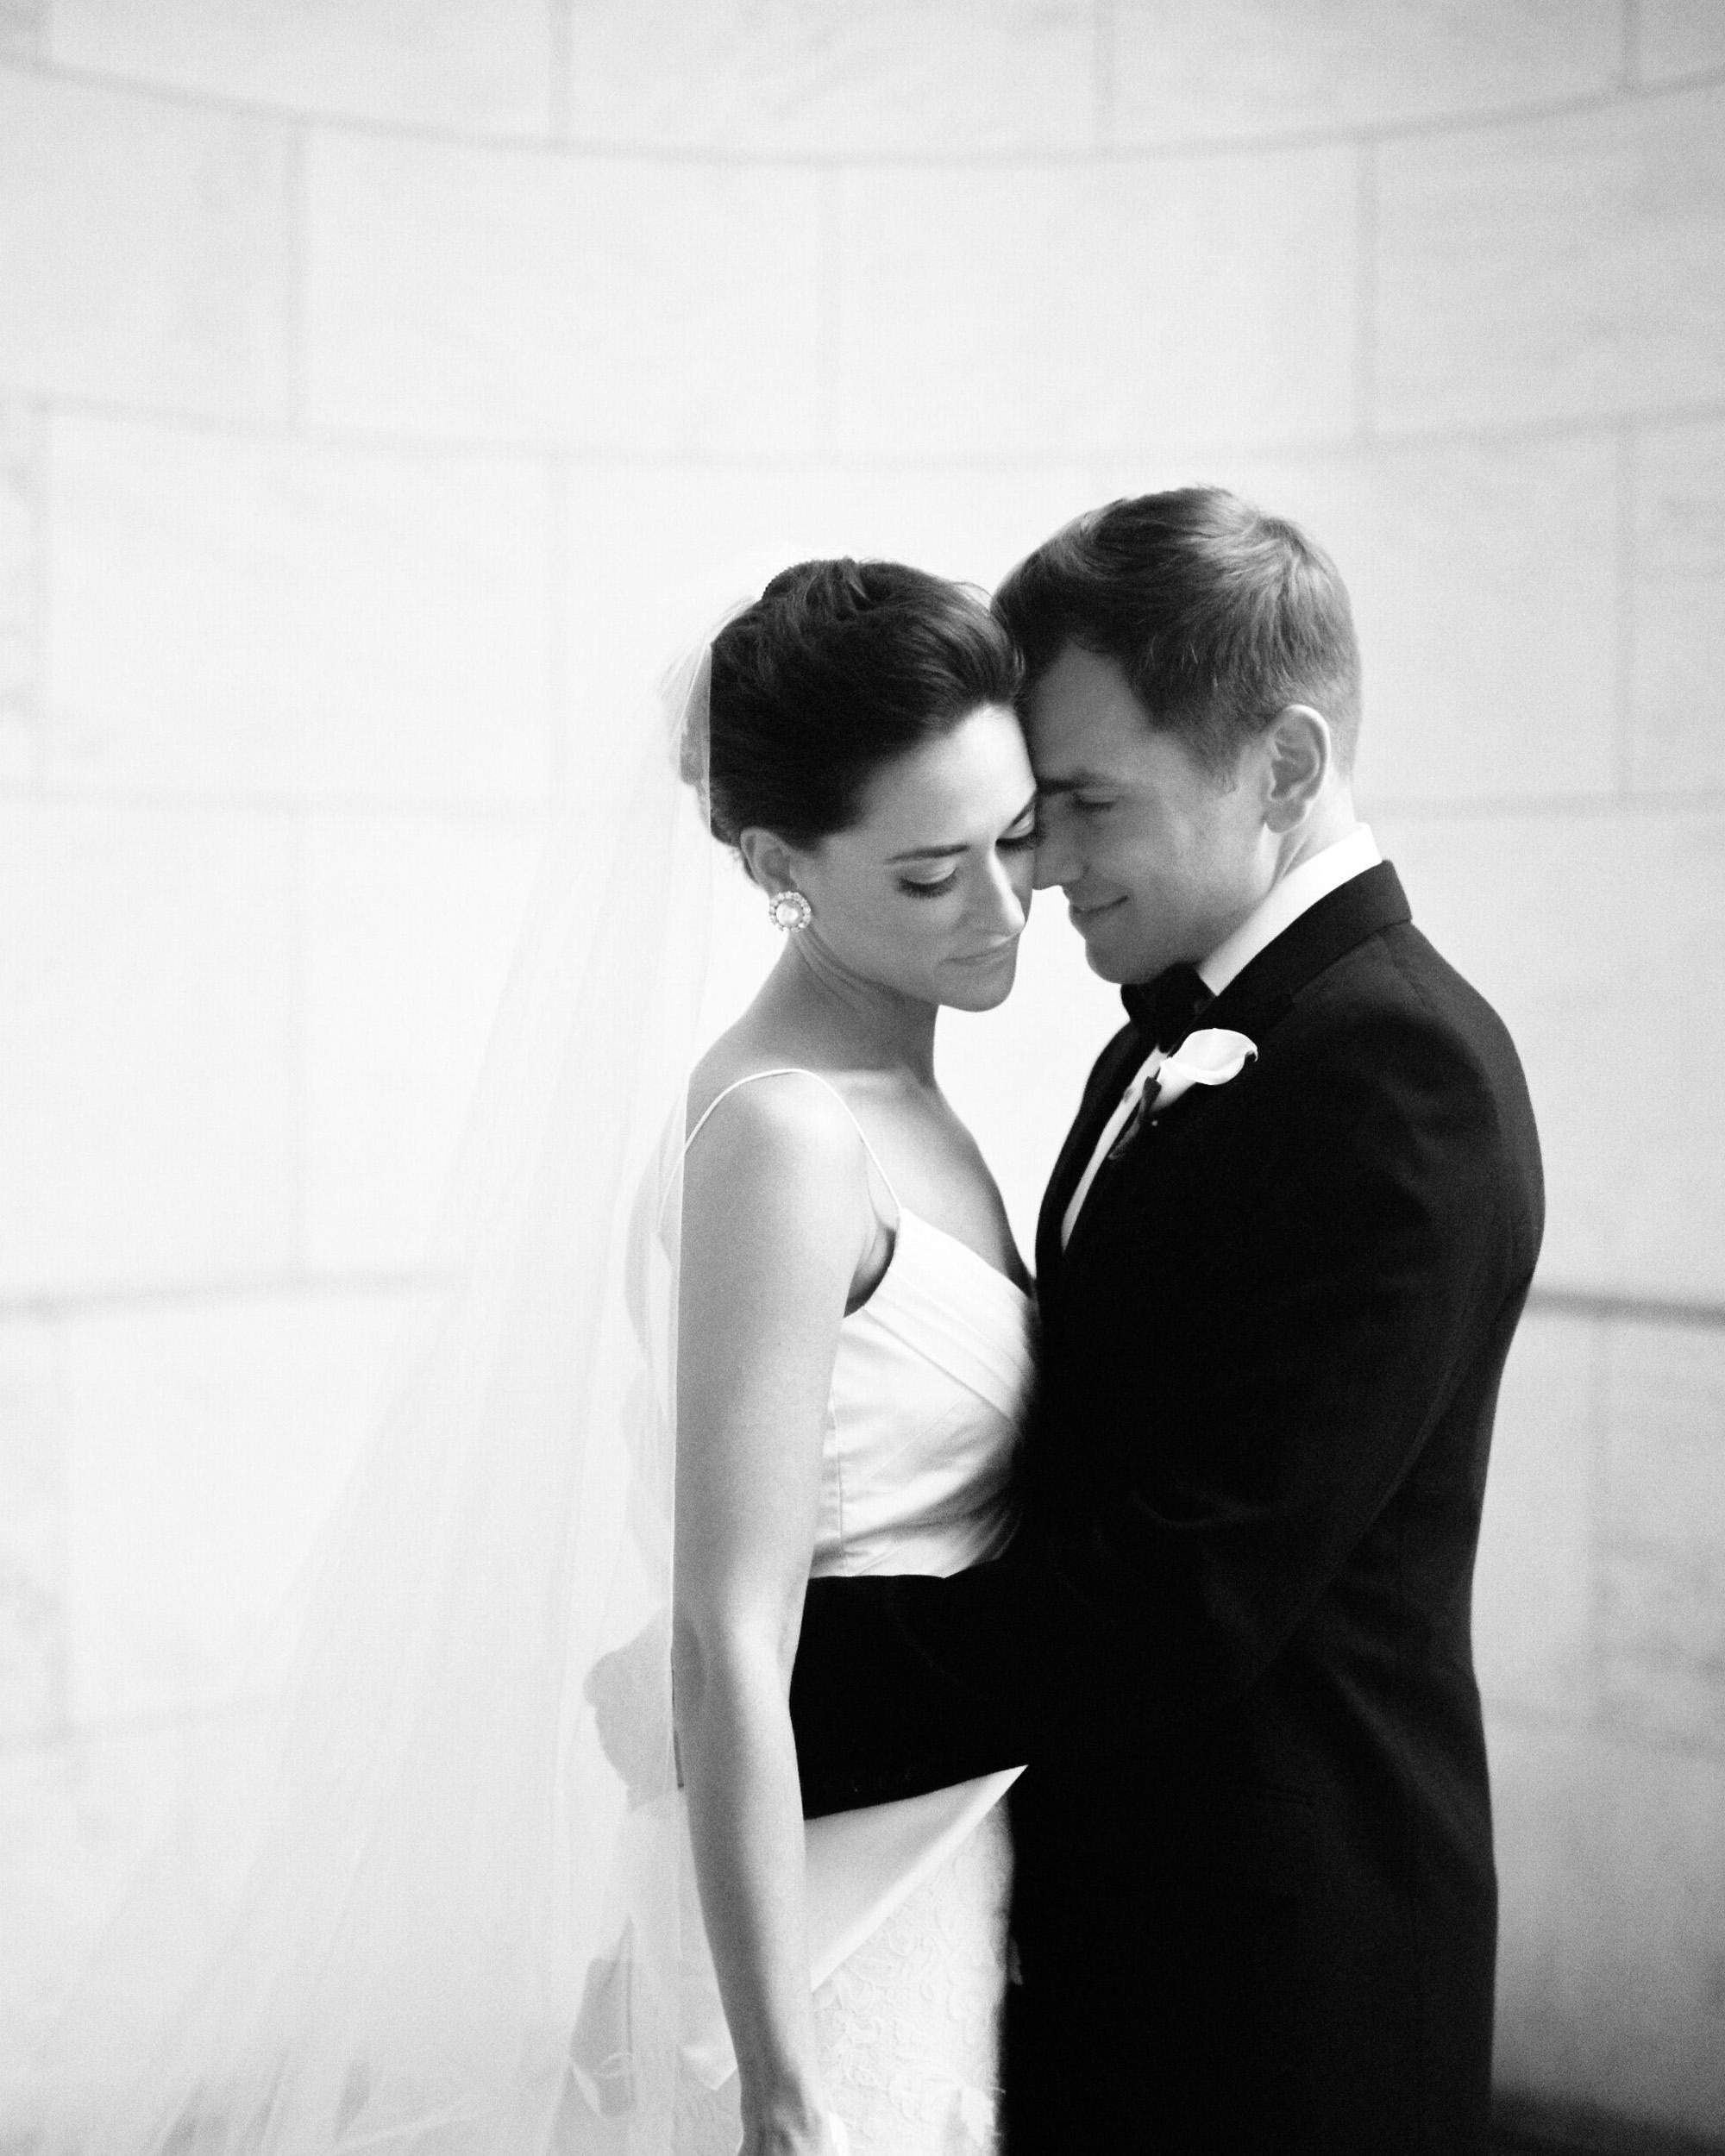 New York Public Library Wedding Photographer 57 - New York Public Library